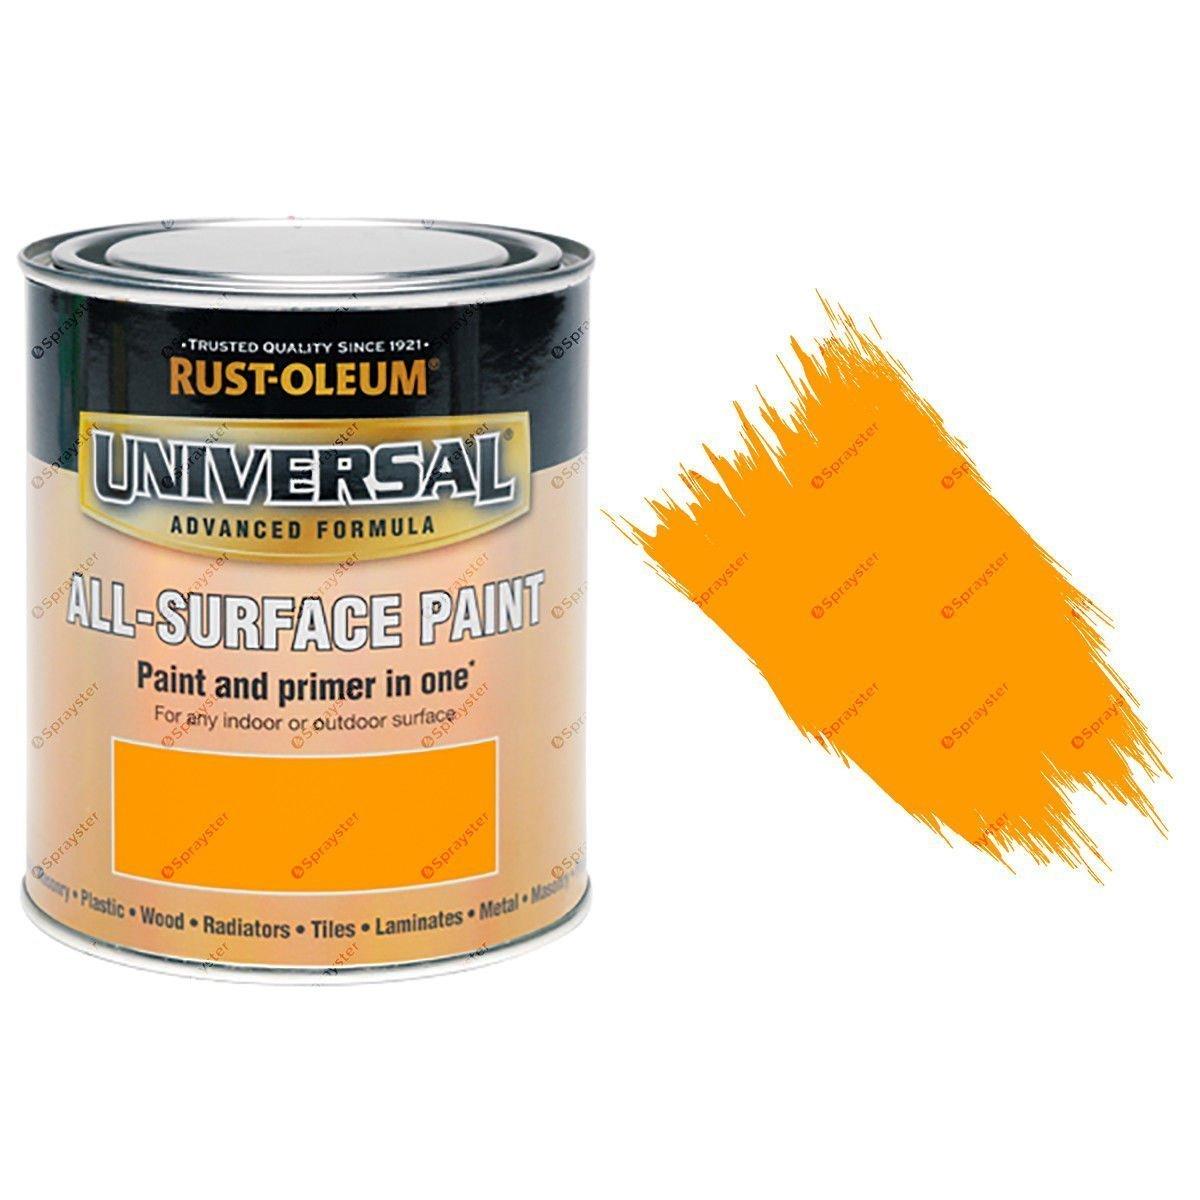 Rust-Oleum-Universal-All-Surface-Self-Primer-Paint-Gloss-Sunset-Orange-250ml-332564274633